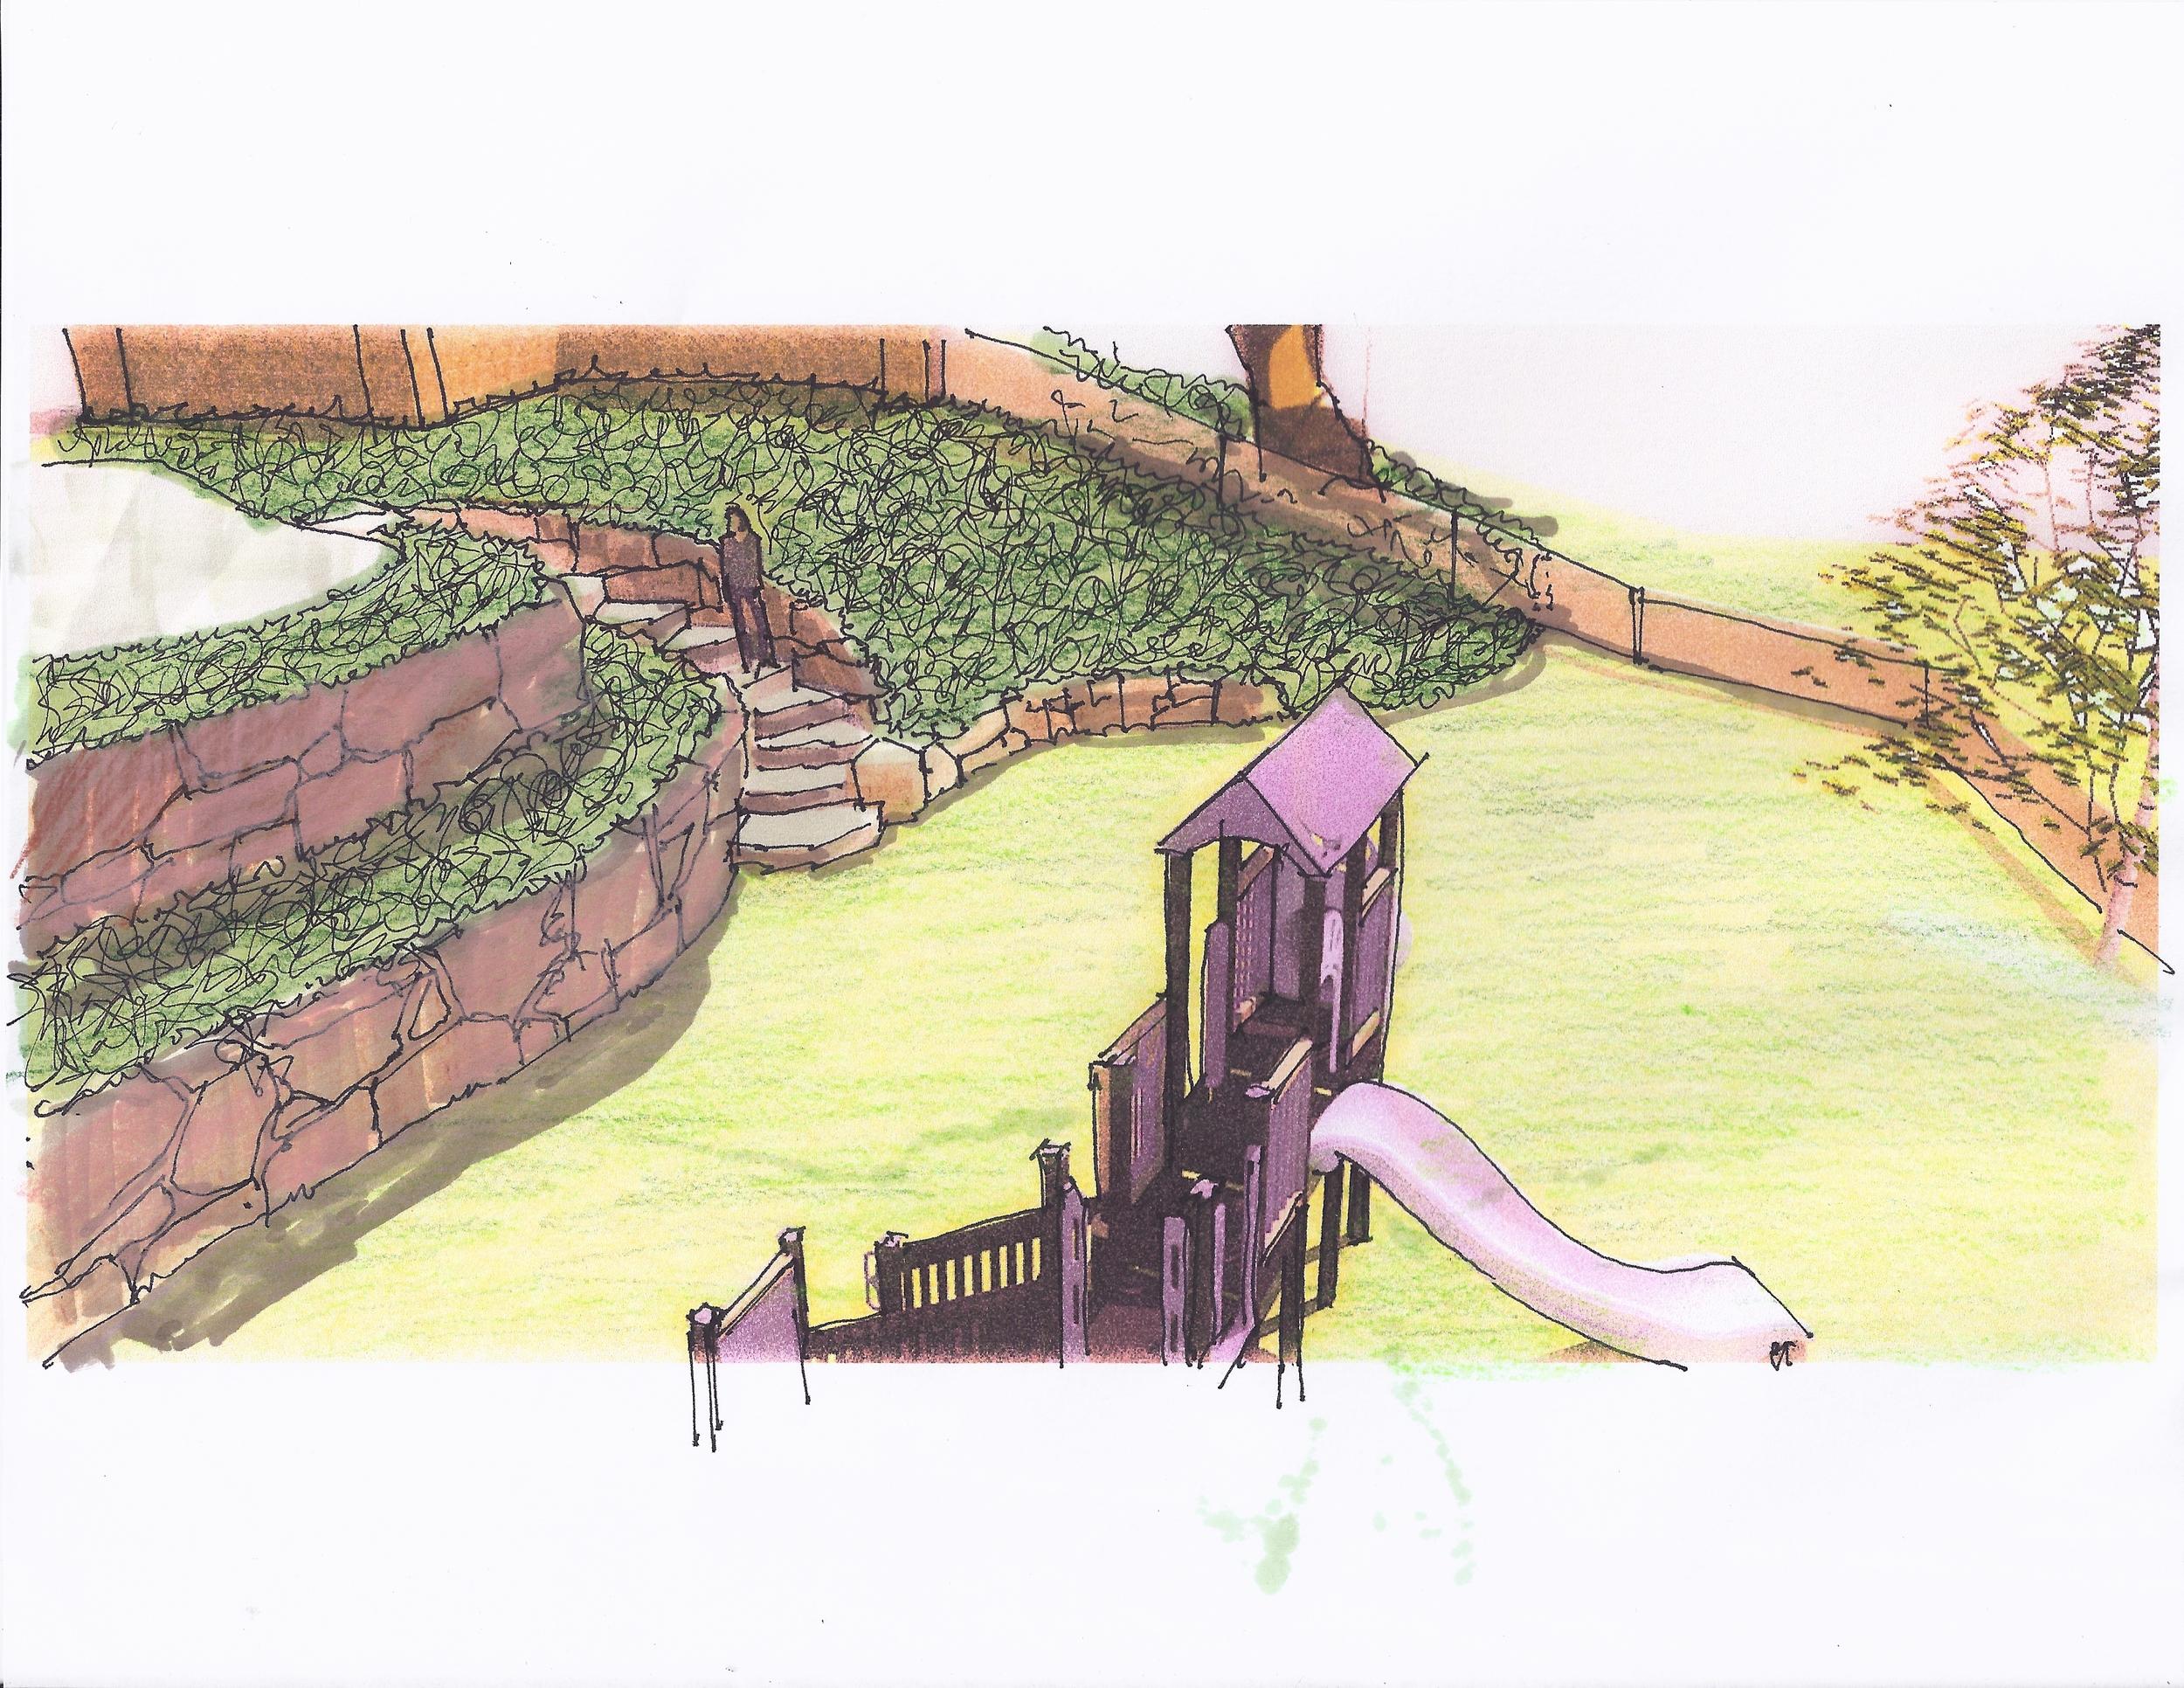 Manhasset Play Area Concept - Render 2